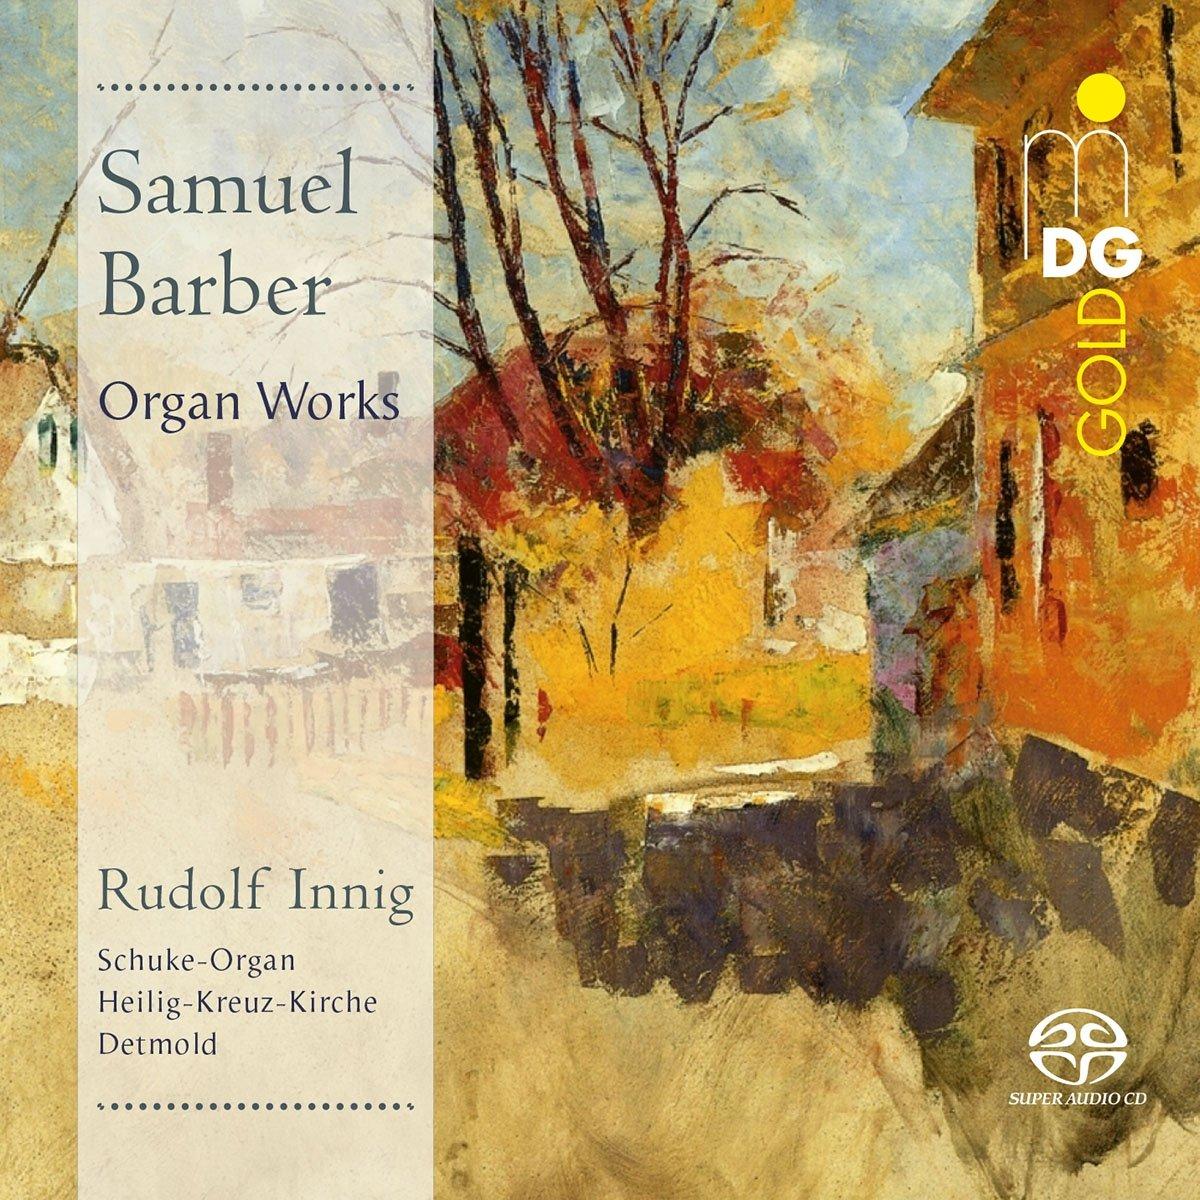 RUDOLF INNIG - Organ Works - Amazon.com Music